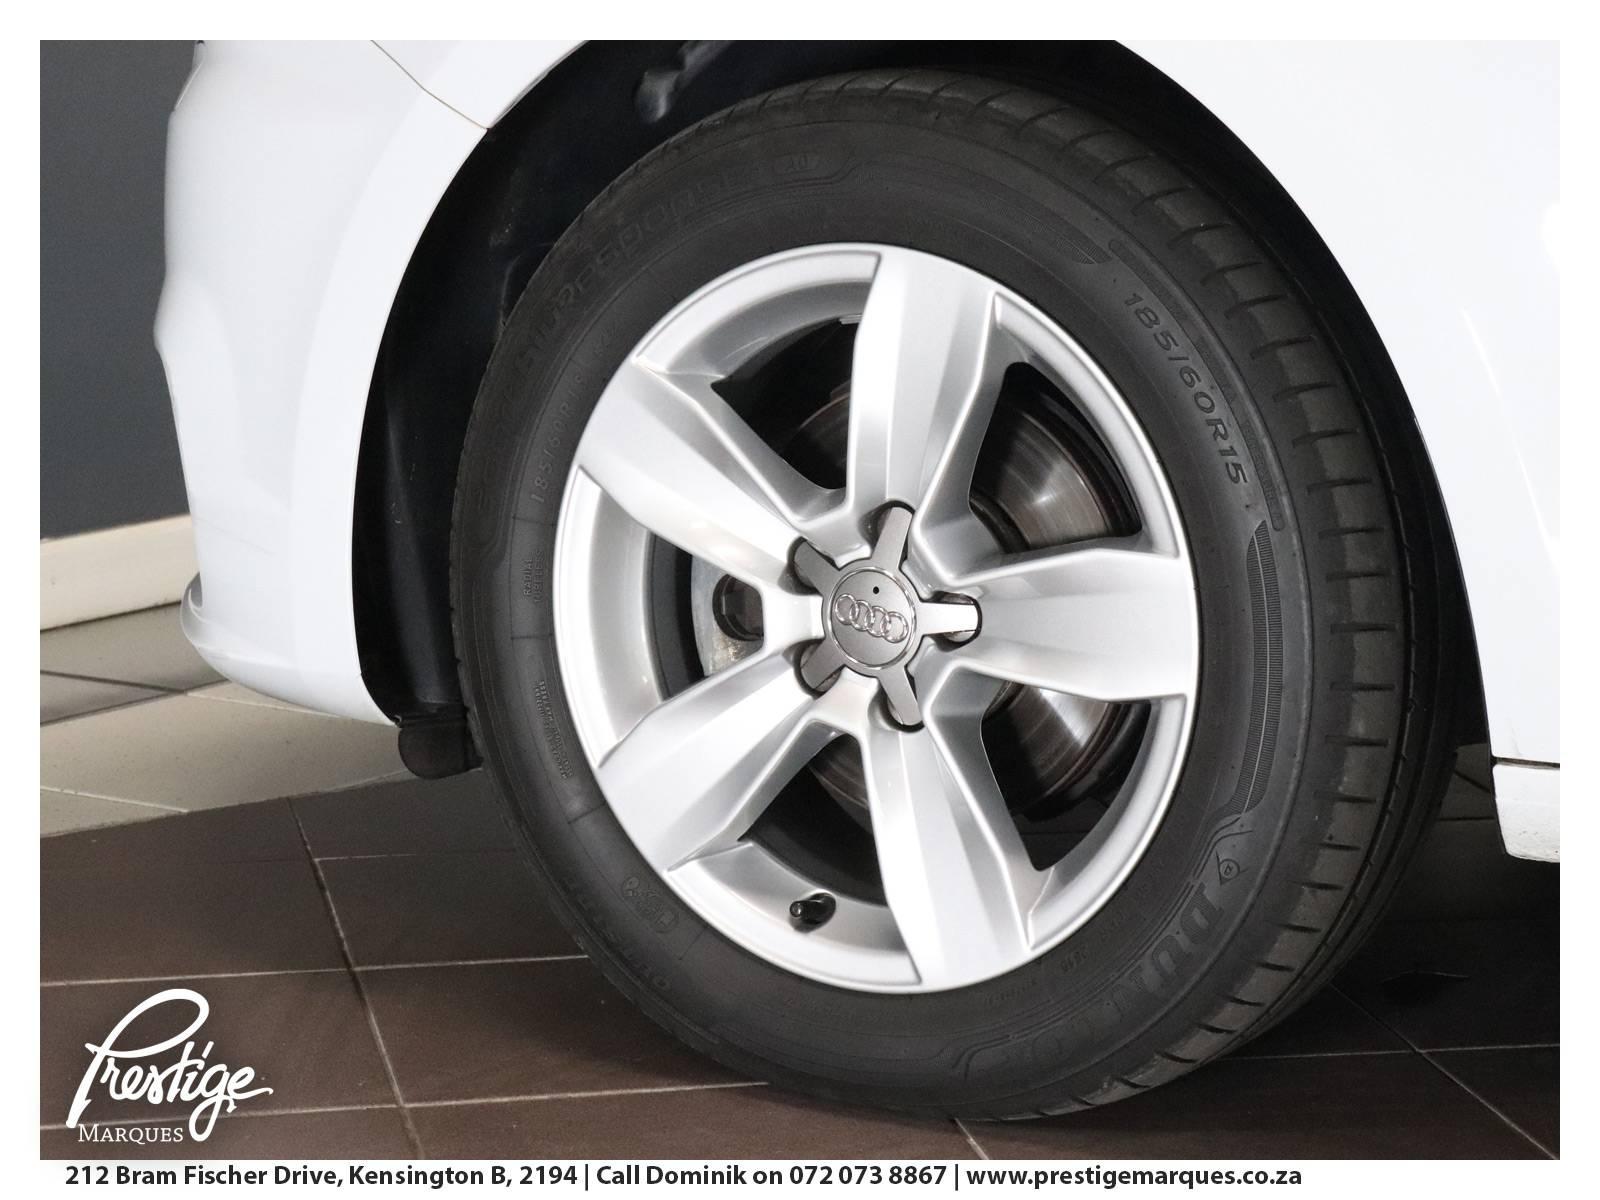 2015-Audi-A1-Prestige-Marques-Randburg-Sandton-9